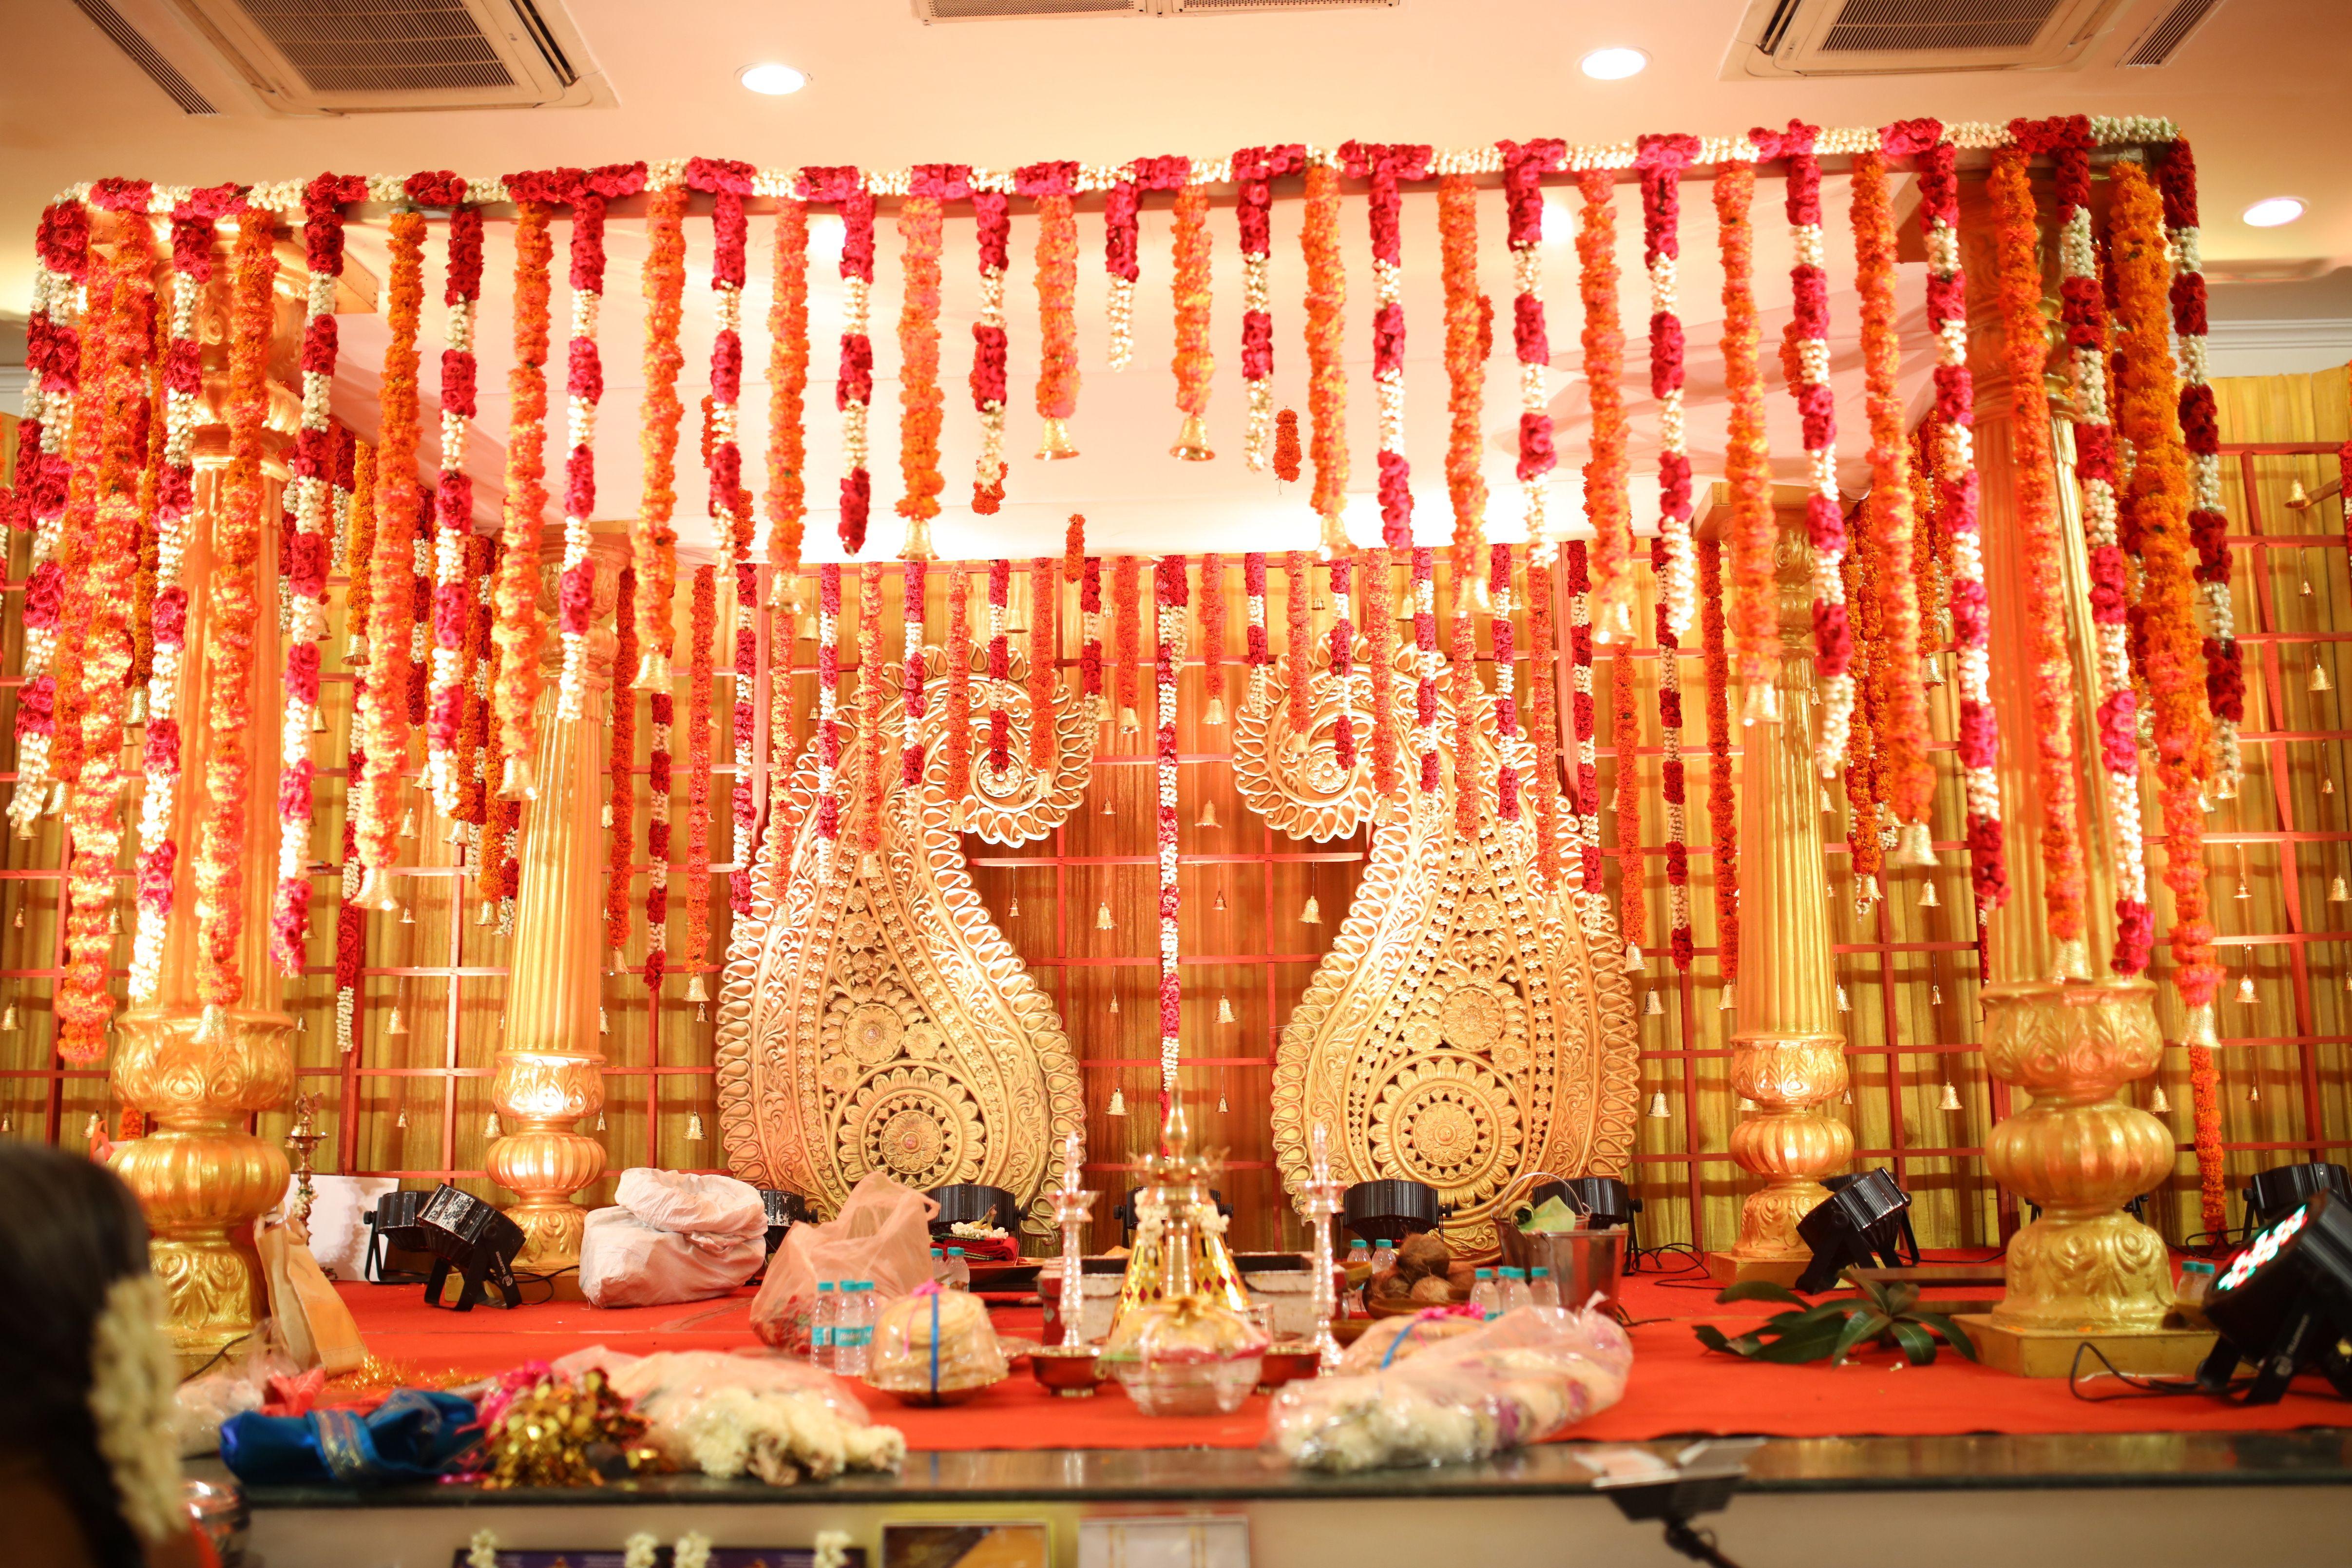 South Indian Mandap Decor Mango Design Marigold Roses Decor Iyer